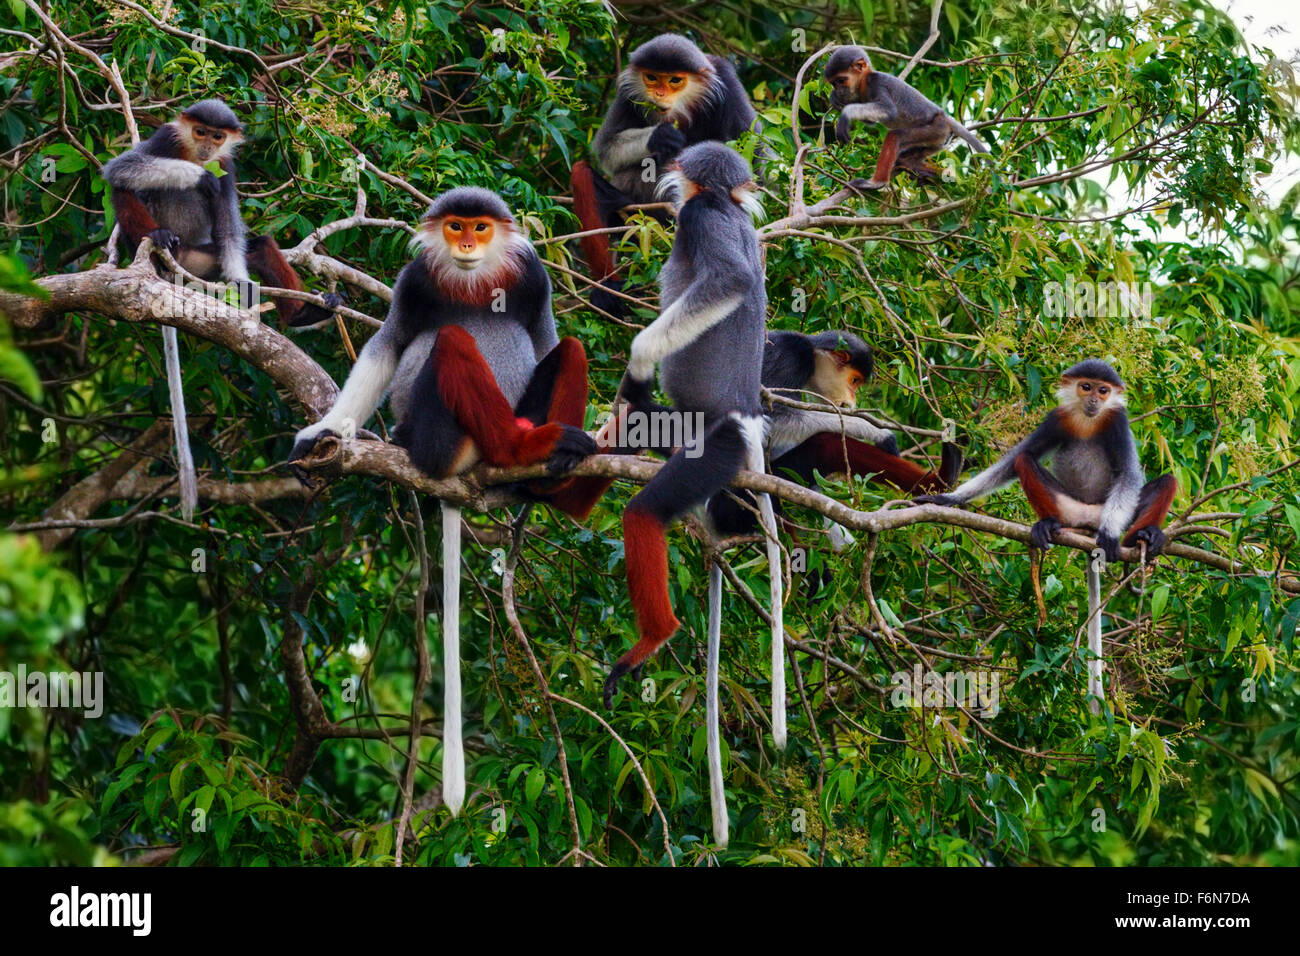 Rot-Schaft-Douc Familiengruppe Fütterung in den Baumkronen im Son Tra Naturreservat in Vietnam Stockbild